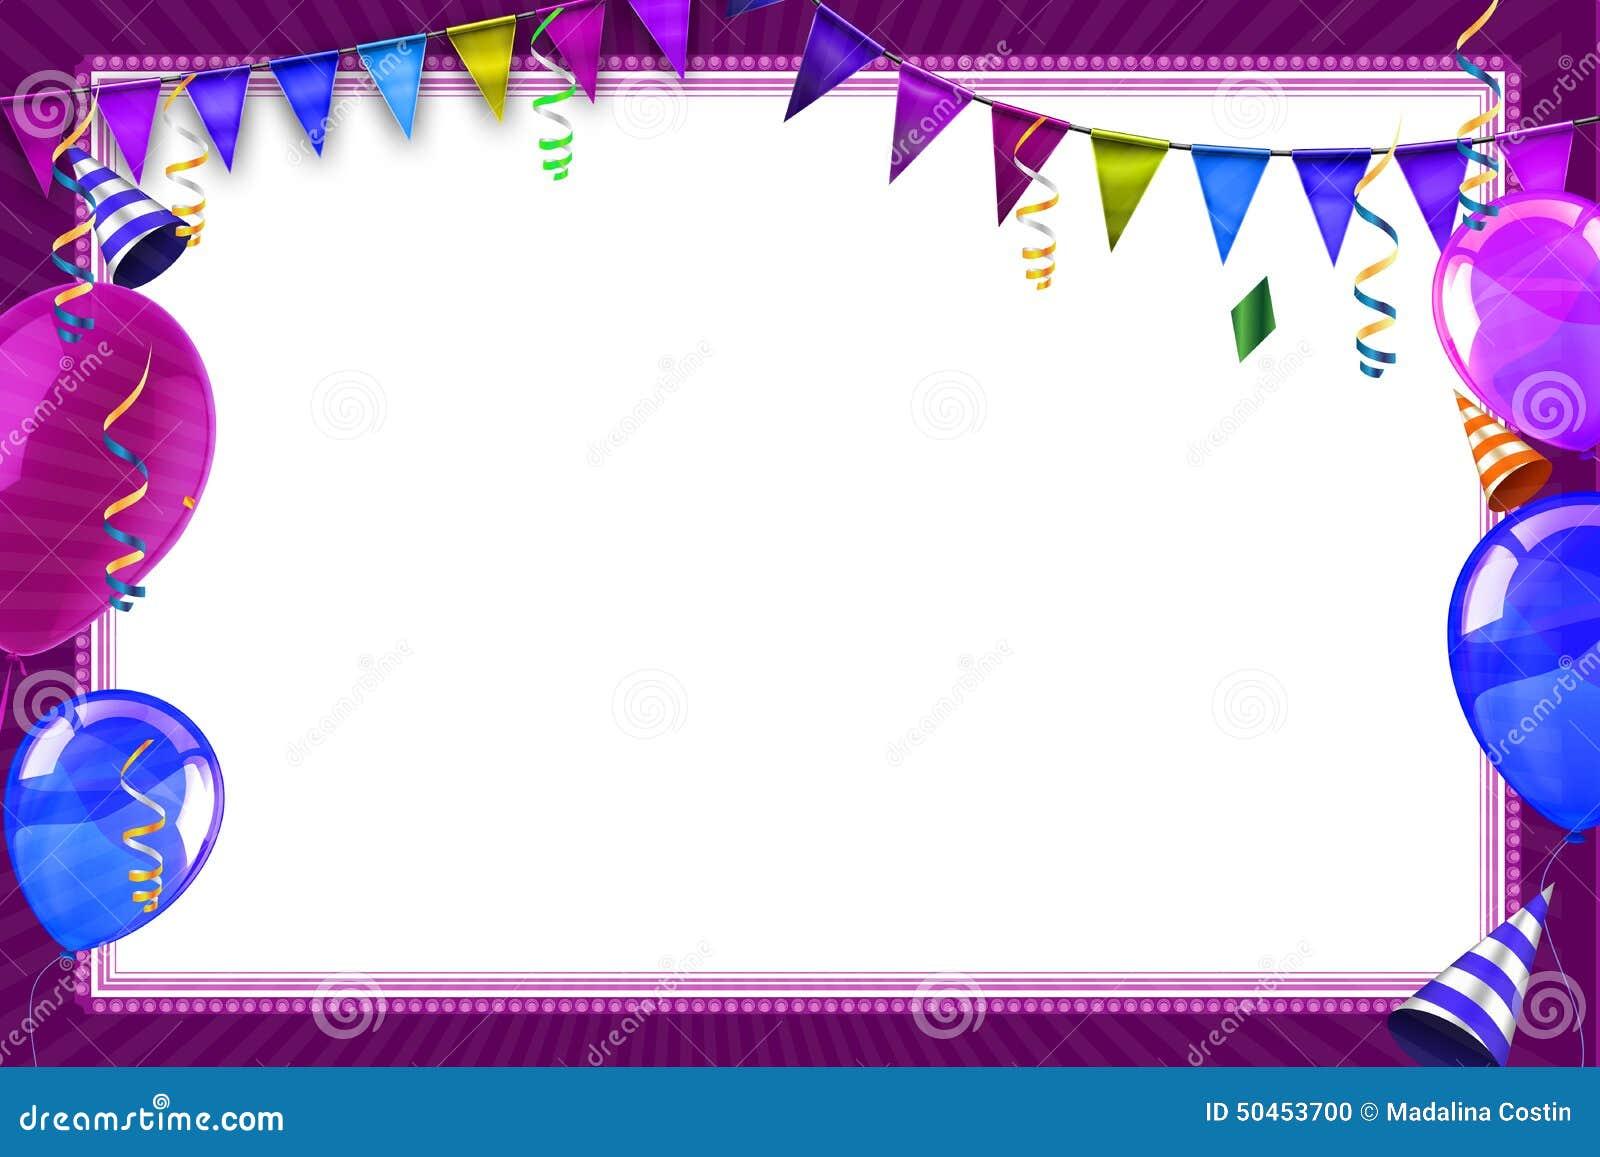 Balloon Birthday Invitation with beautiful invitation design